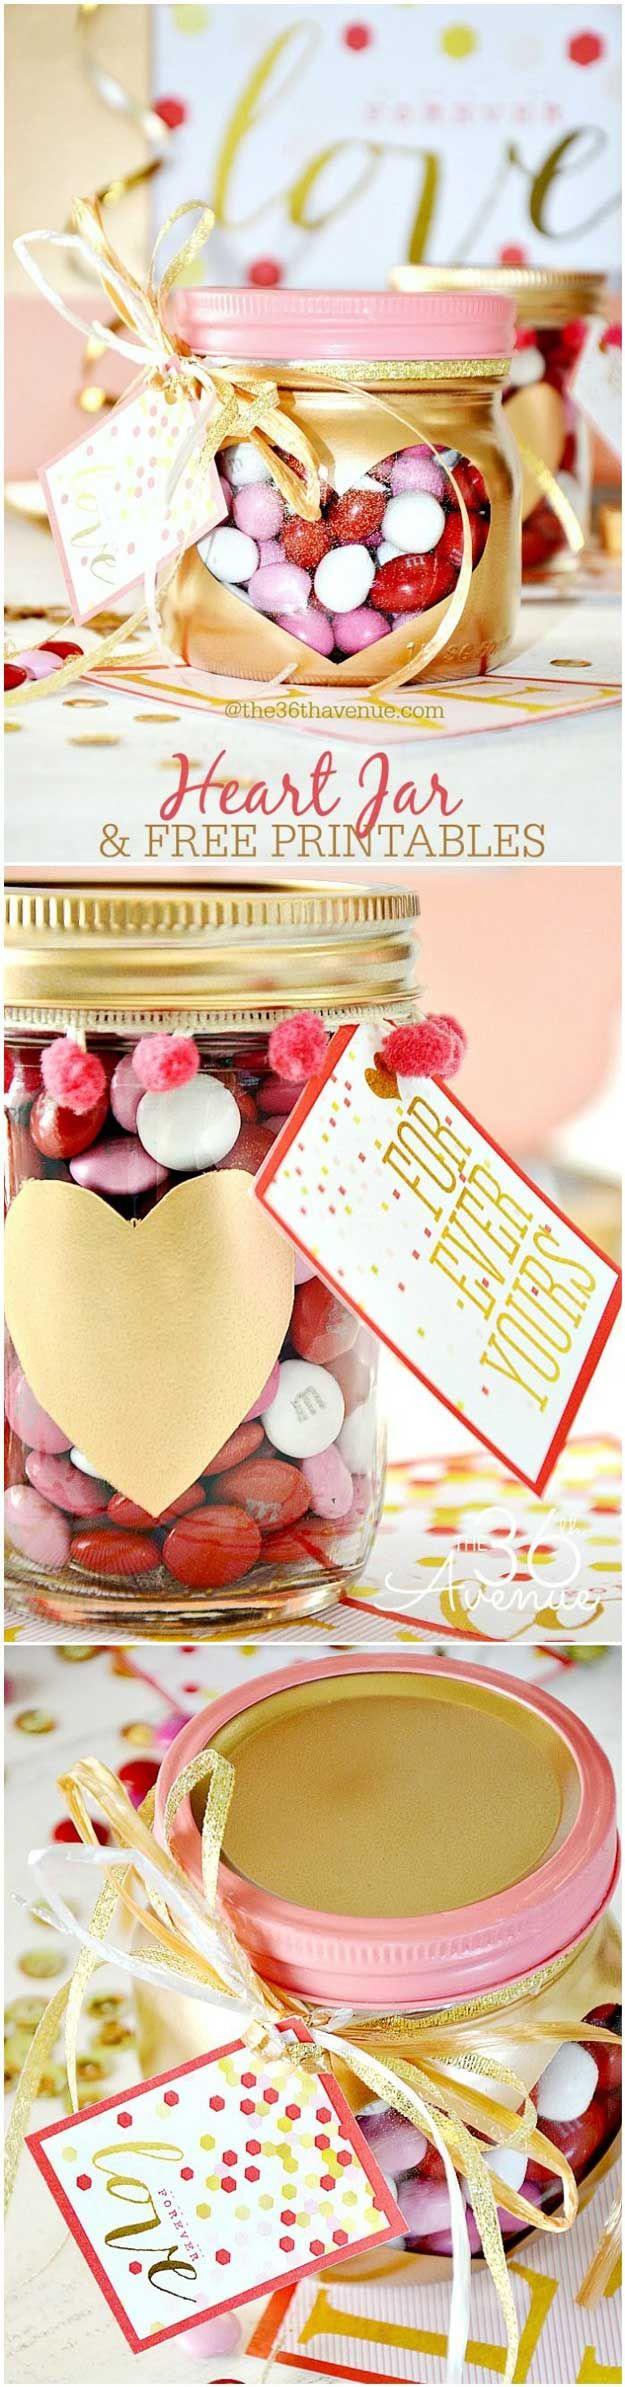 office valentines day ideas 54 Mason Jar